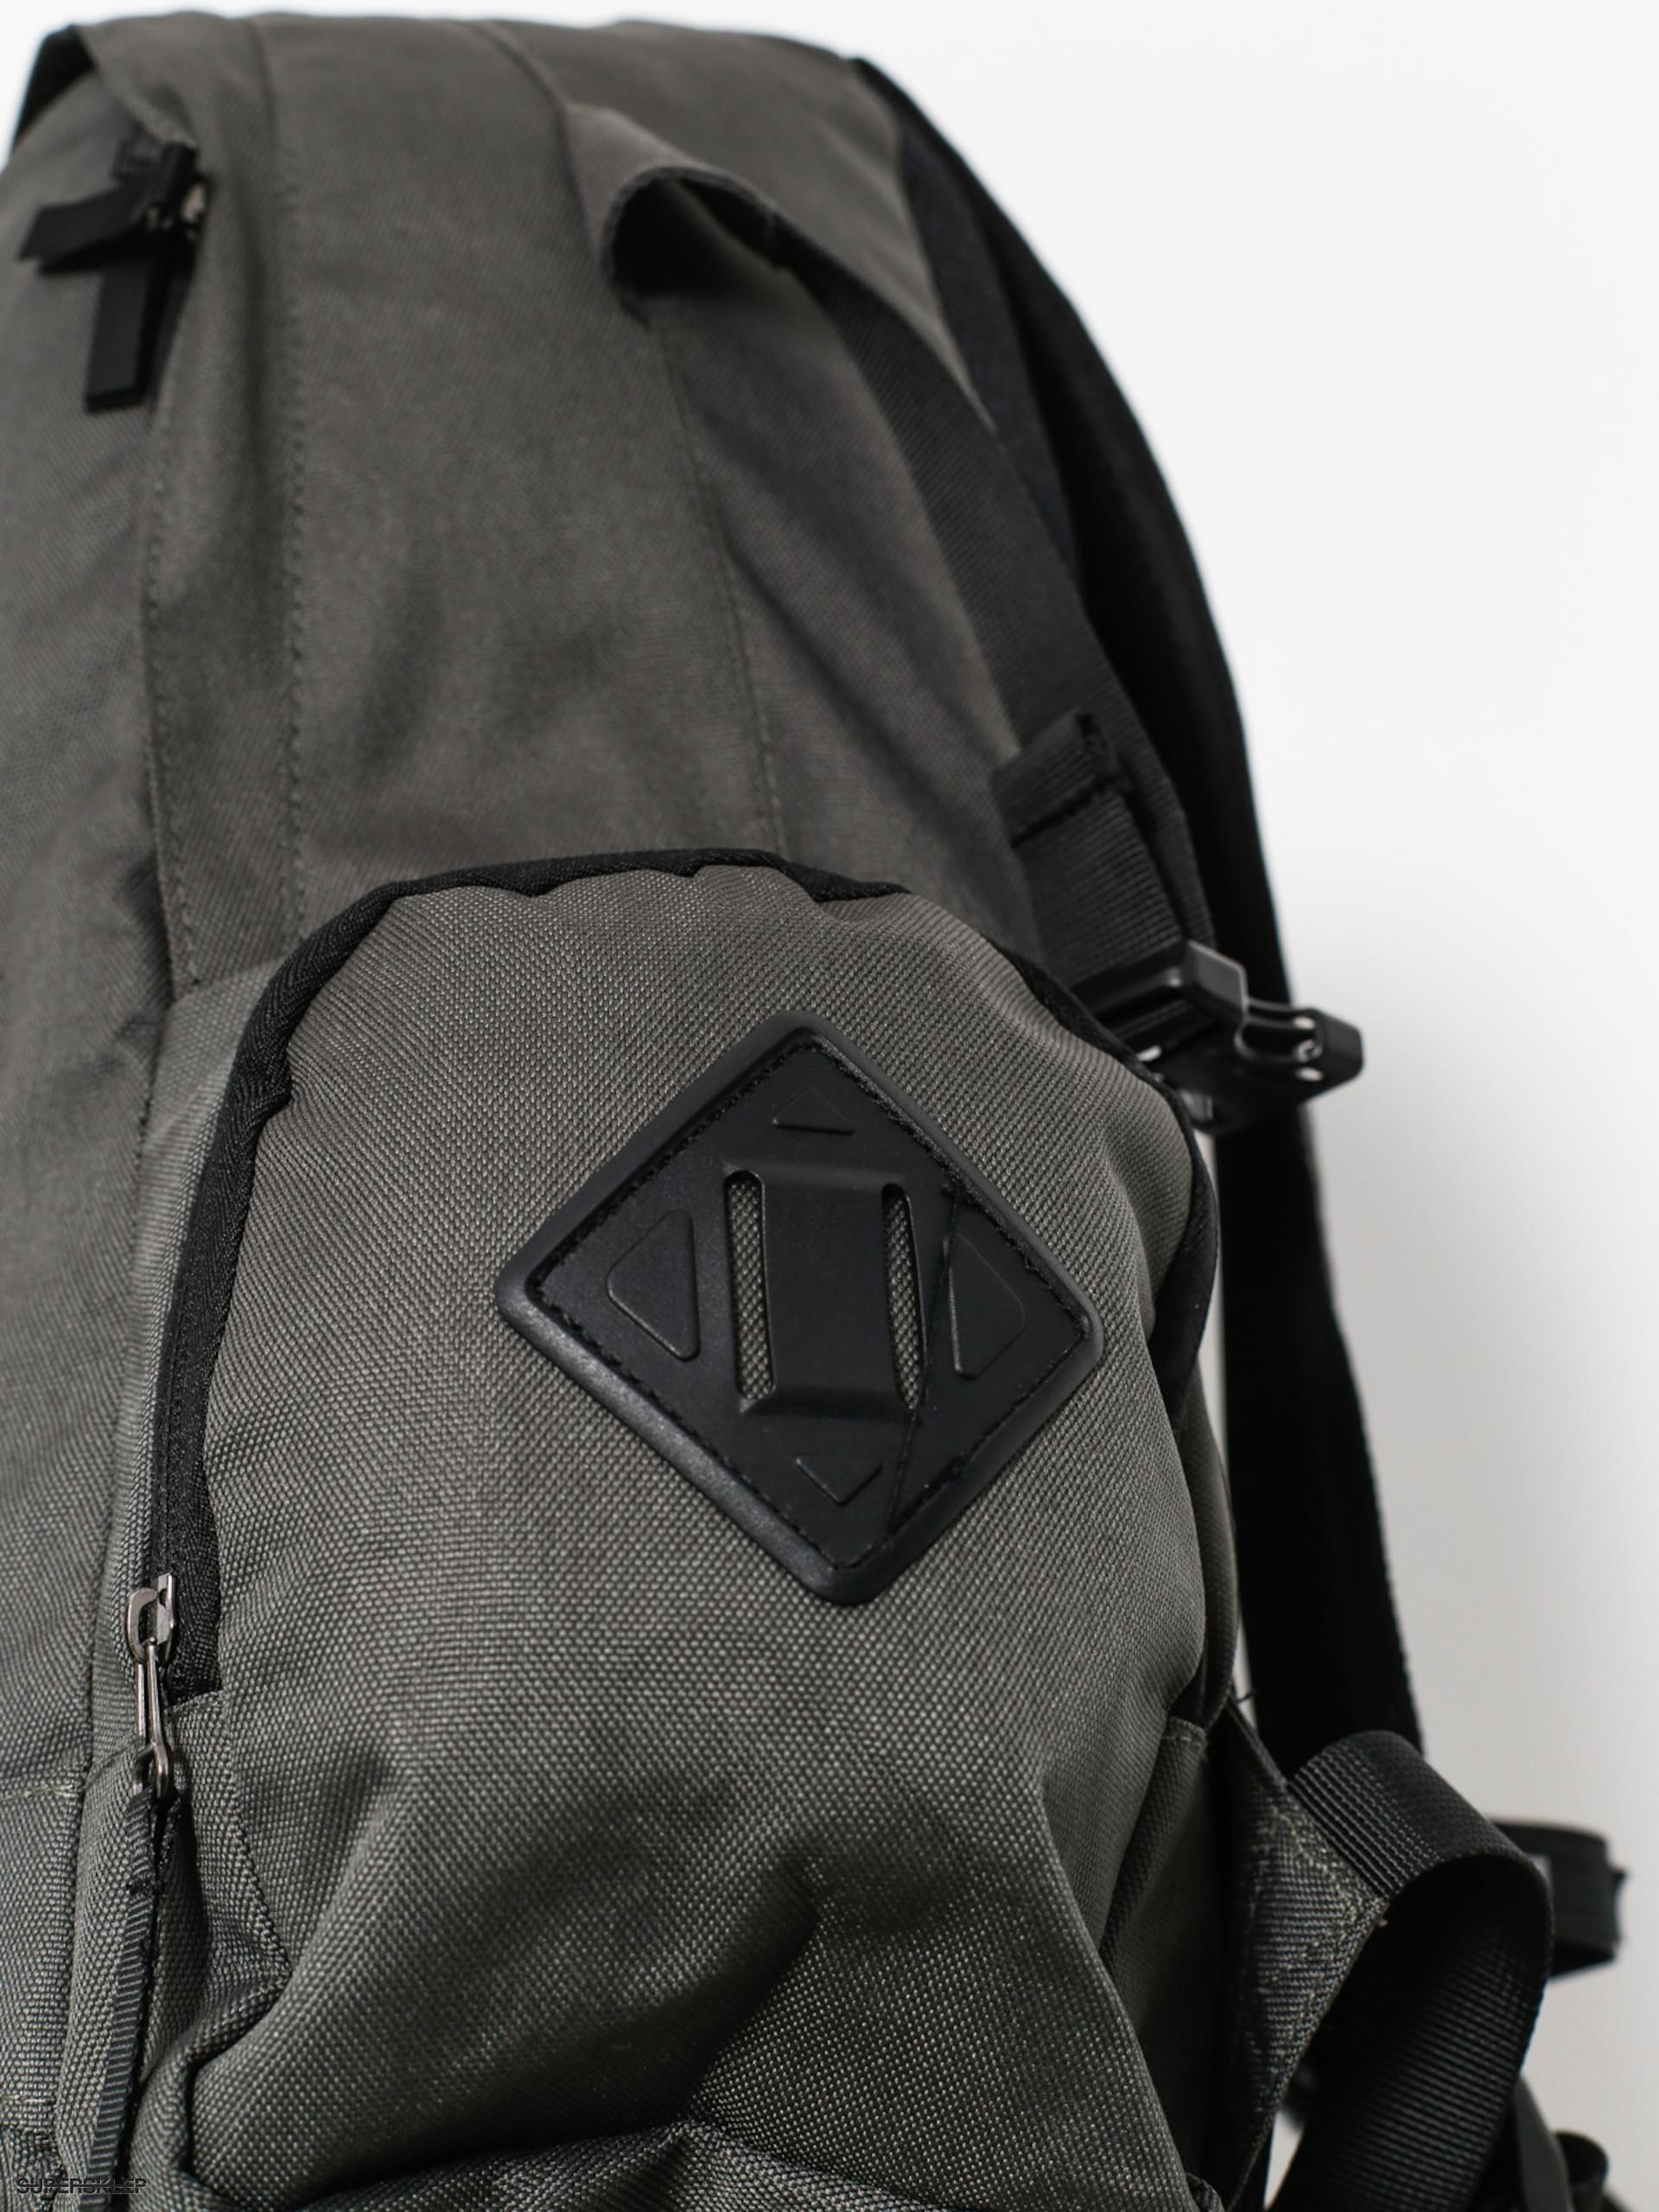 c835ec100d8d2 Plecak Etnies Essential Skate (charcoal)